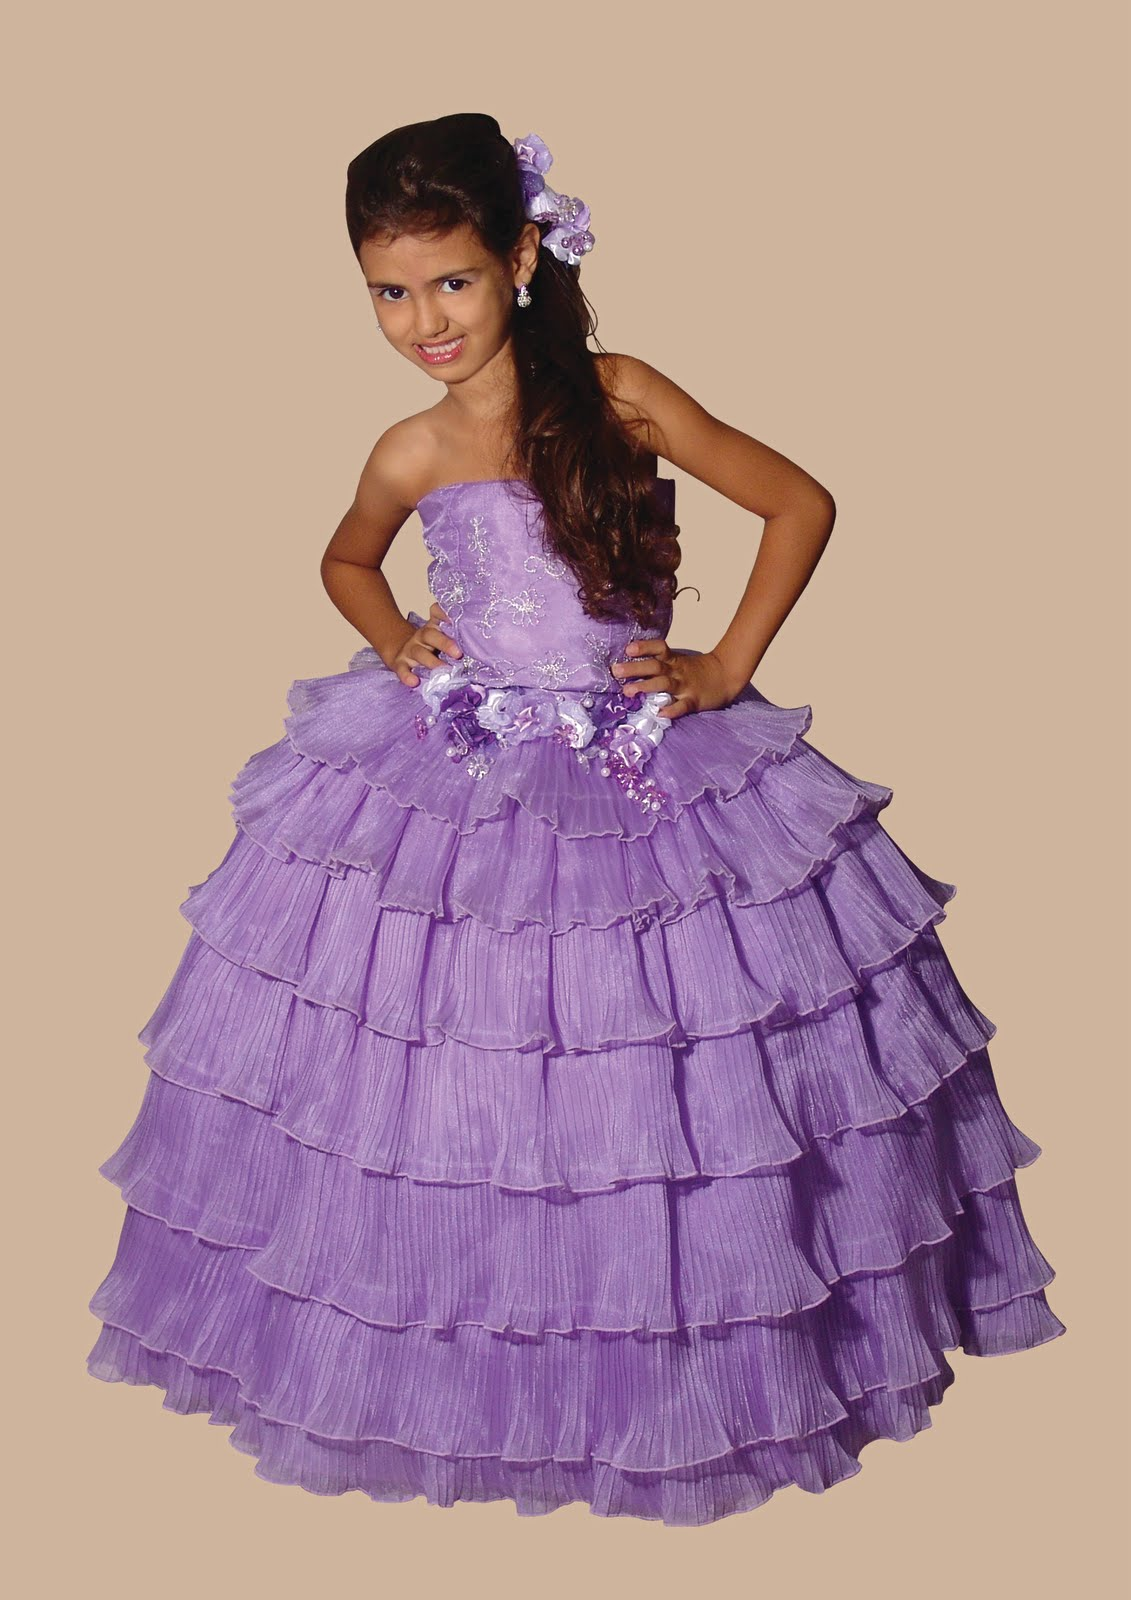 Perfecto Vestidos De Dama De Albuquerque Motivo - Ideas de Vestidos ...